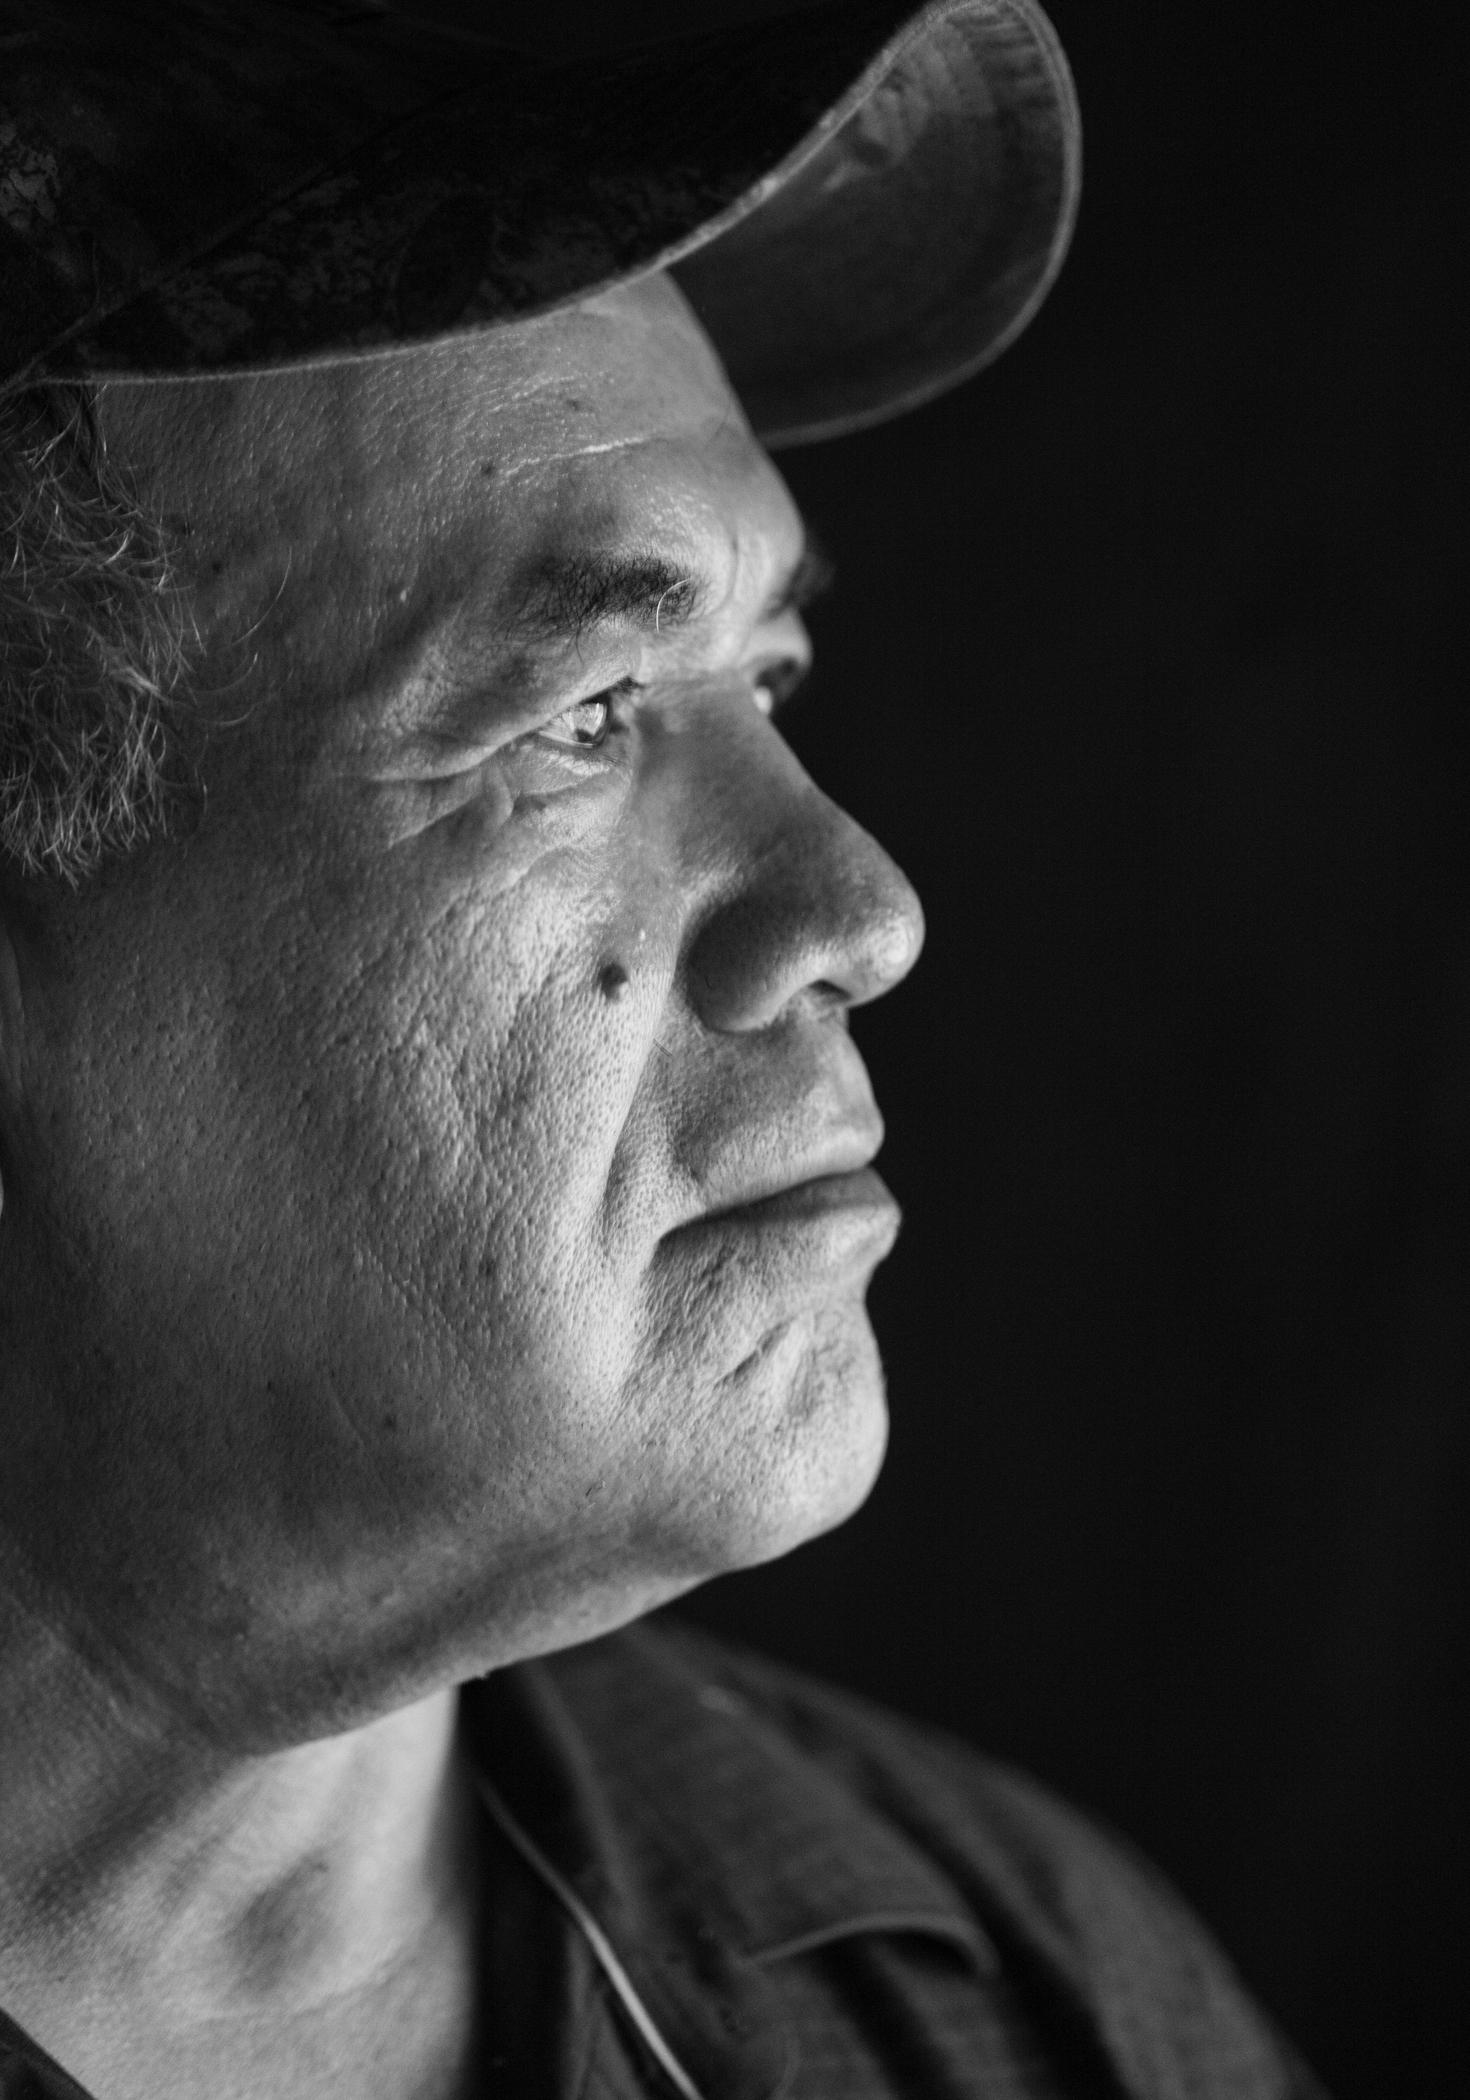 KCA-016 Ki-tah-pah-tumak aski ethinewak [keeper of the land] Gord, Nisichawayasihk Cree Nation, 2016, AP.jpg